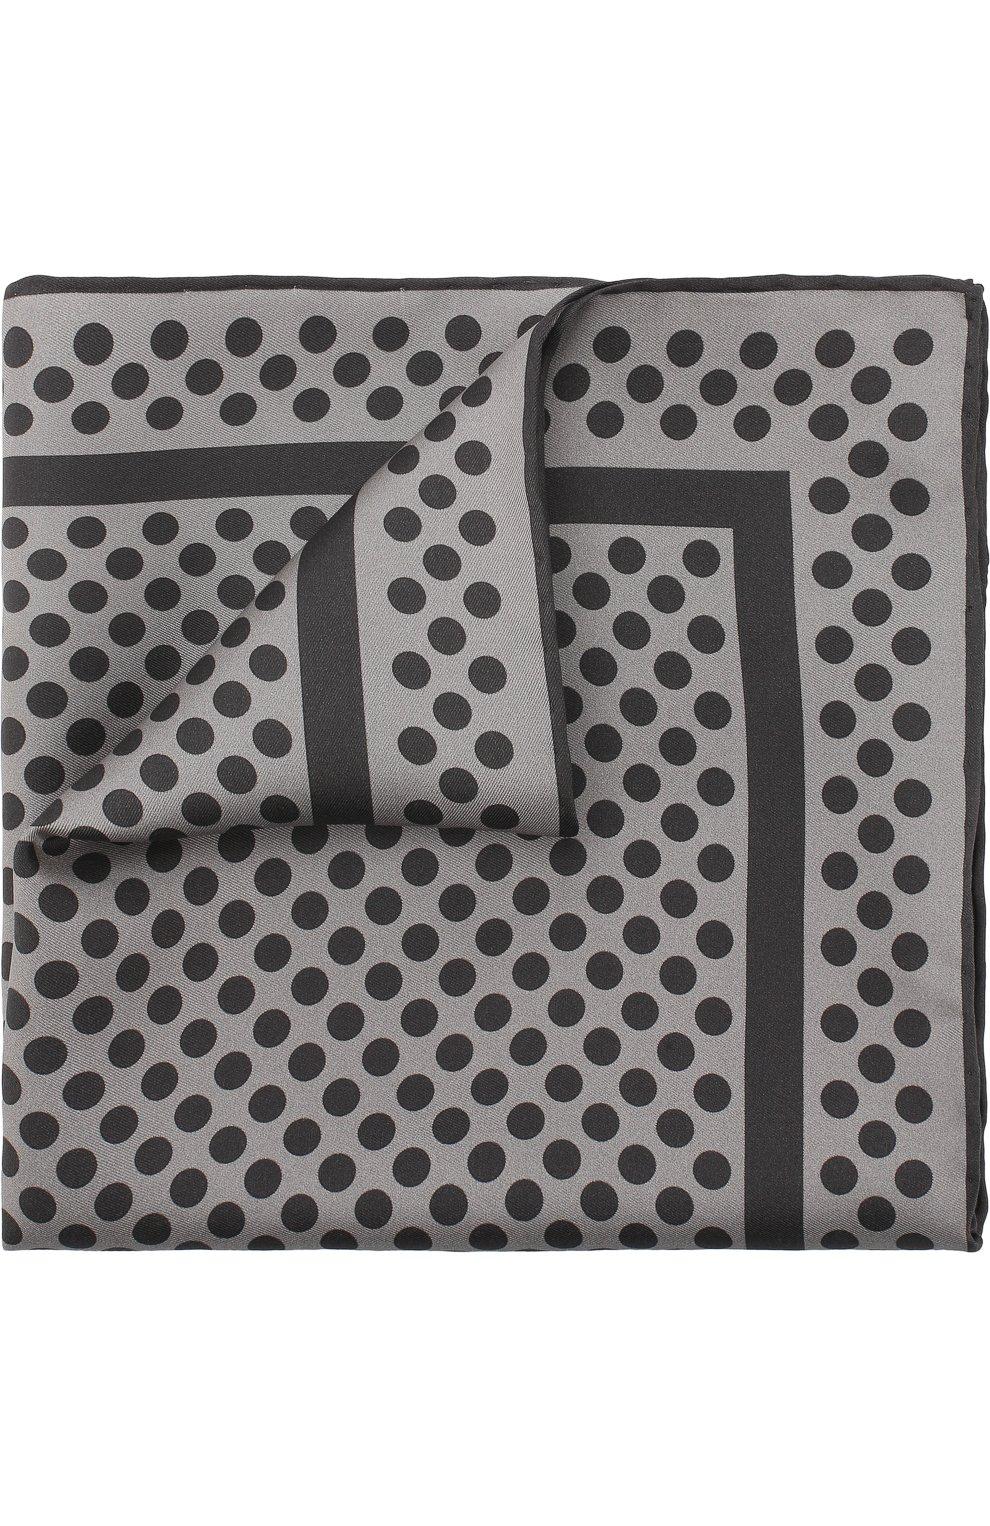 Мужской шелковый платок с узором TOM FORD серого цвета, арт. 3TF102/TF312 | Фото 1